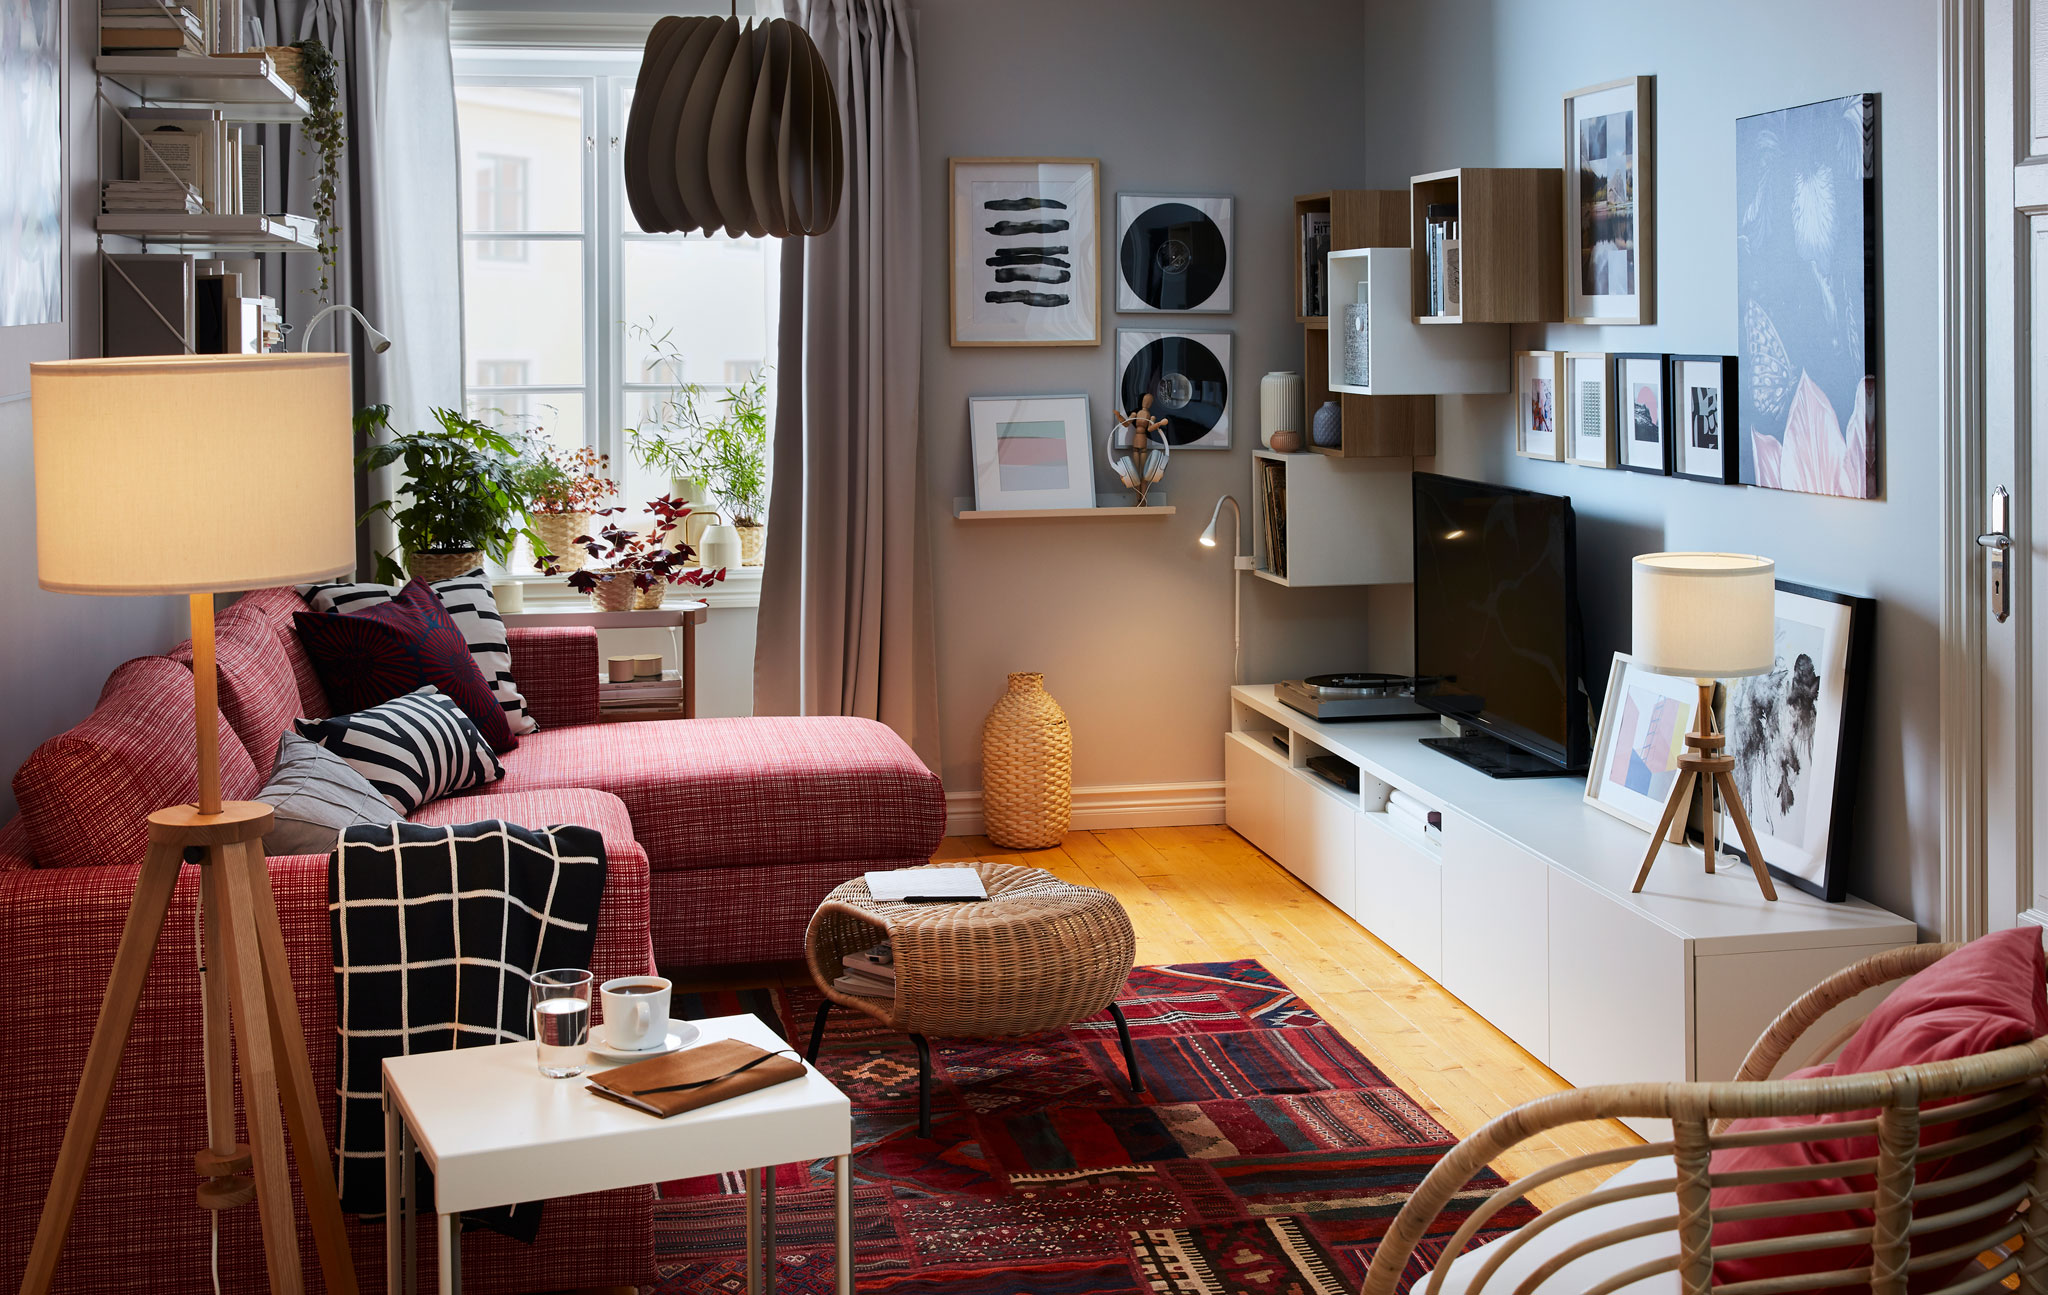 Ruang tamu berukuran kecil dengan tempat tidur sofa dan kursi malas di satu sisi; lemari bufet, ruang penyimpanan, TV, stereo dan dekorasi seni di sisi lain.